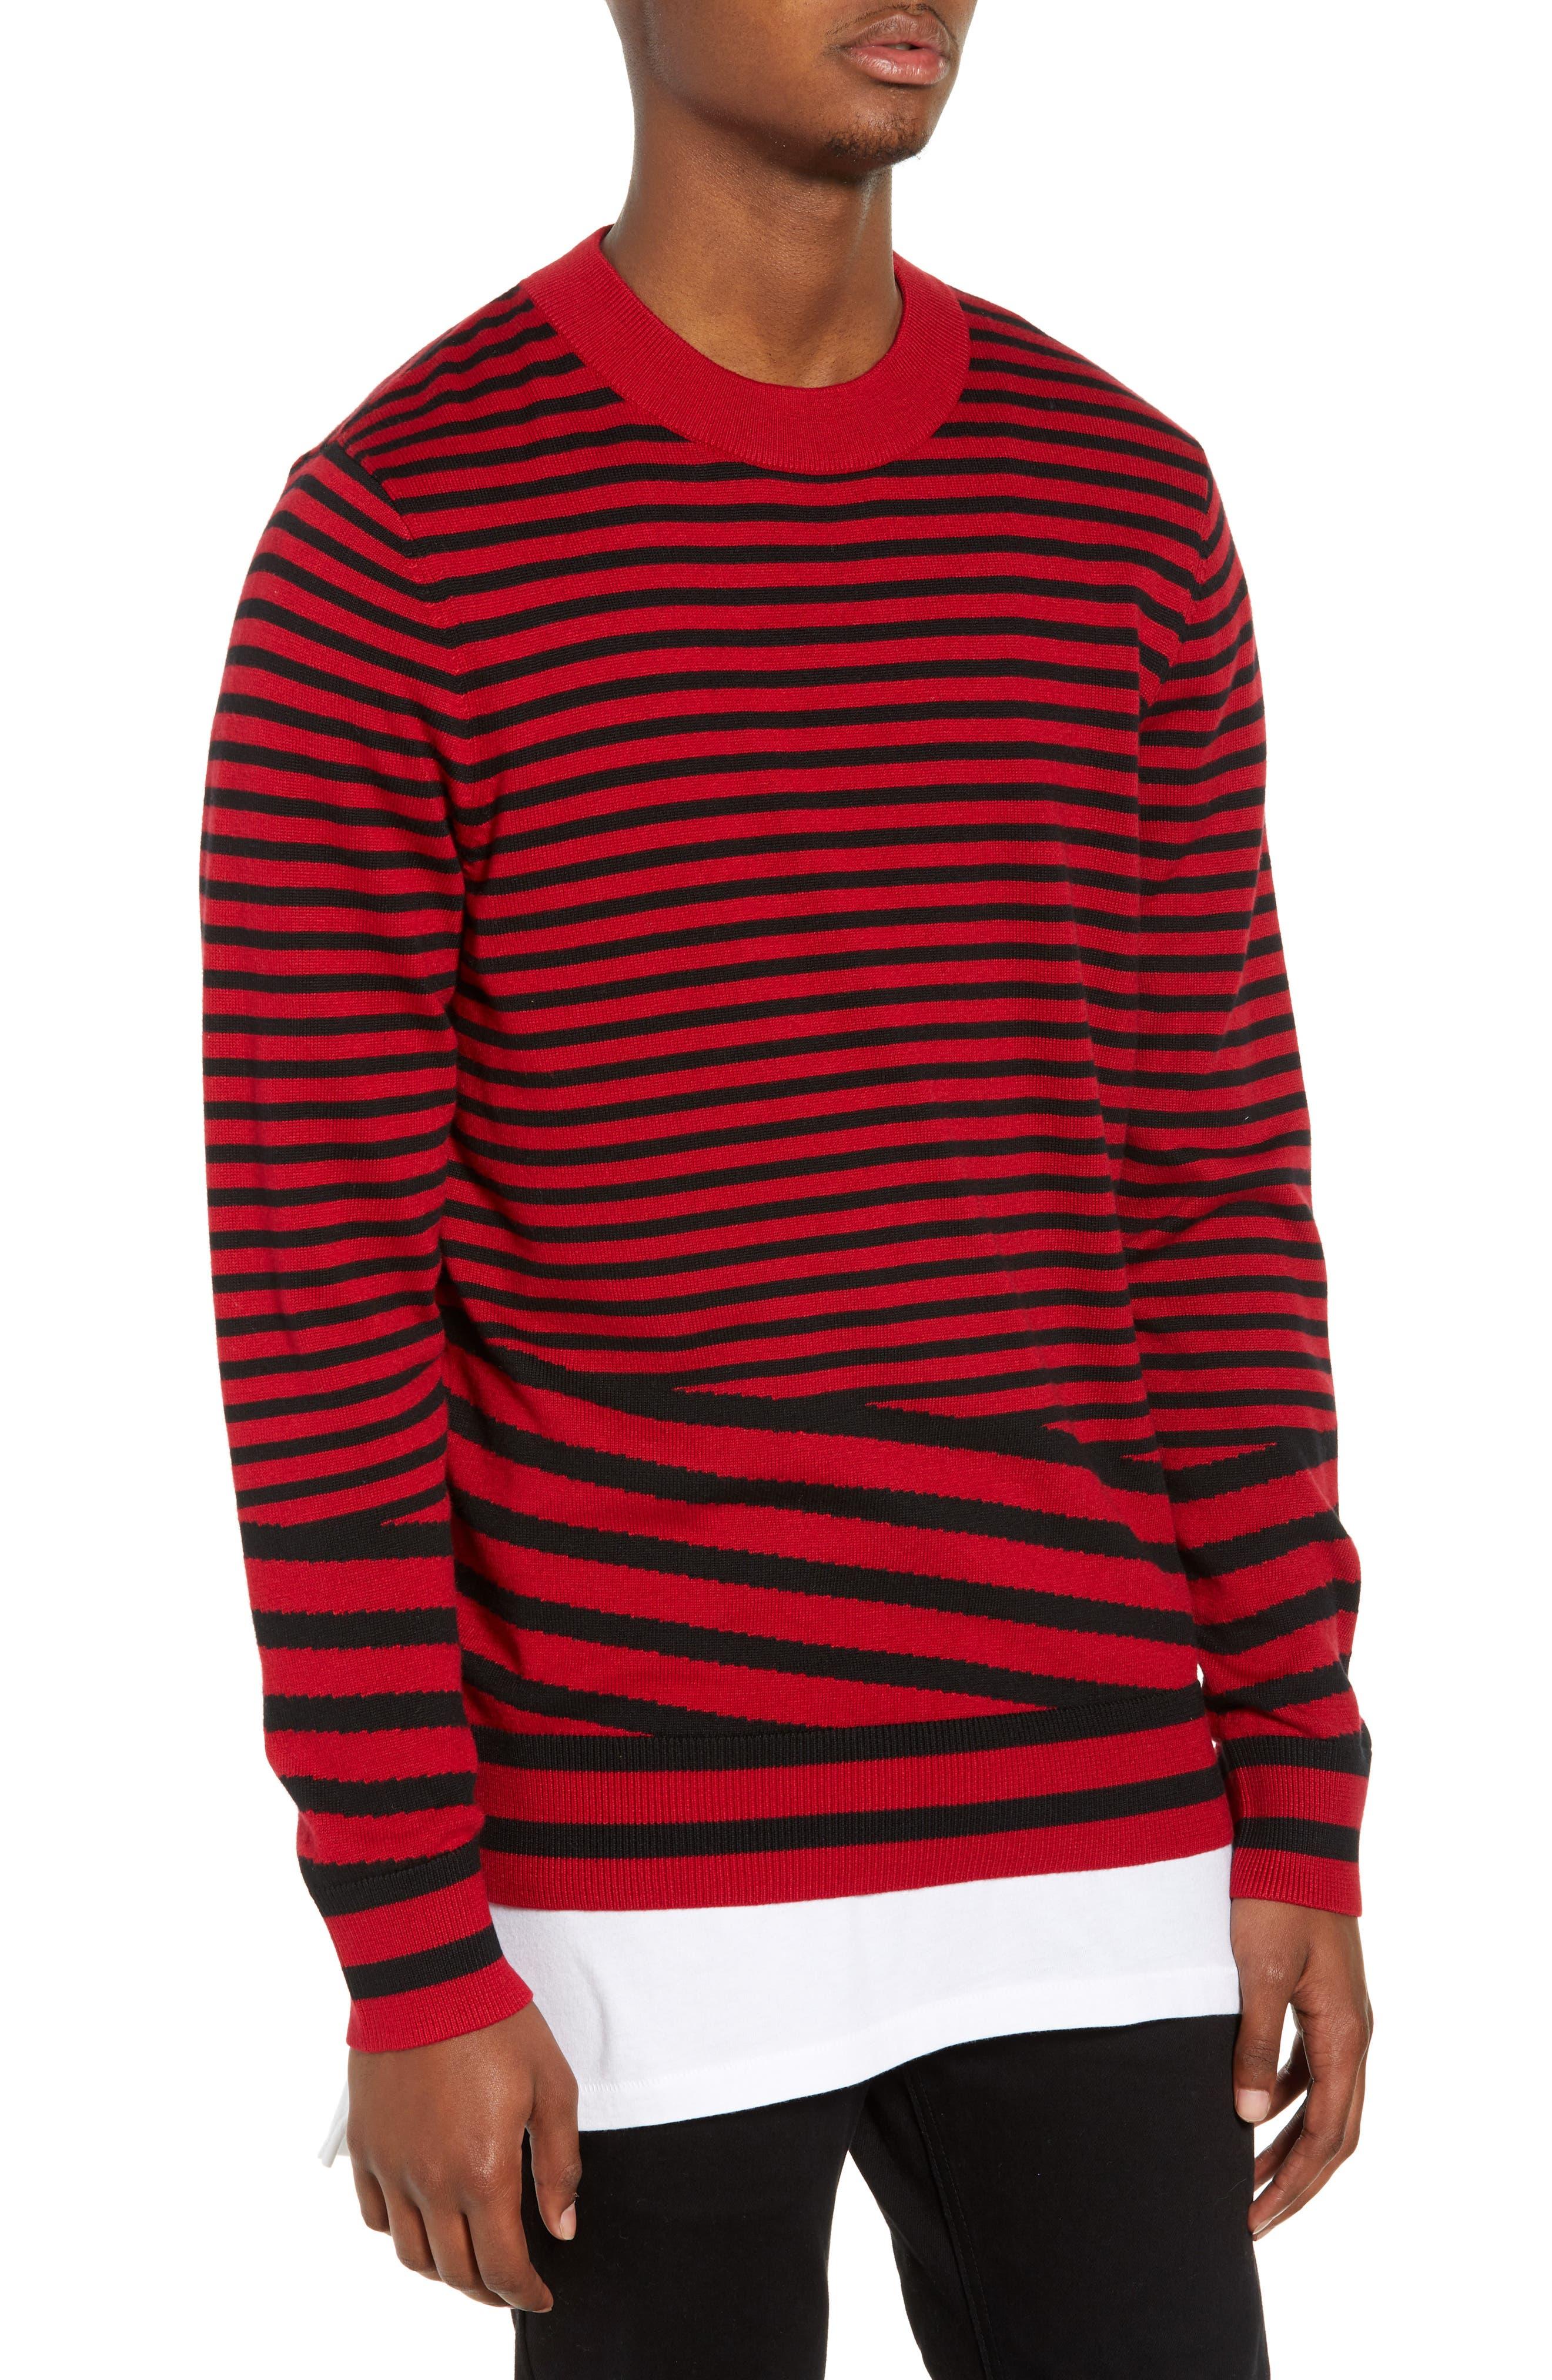 Asymmetrical Stripe Longline Sweater,                             Main thumbnail 1, color,                             RED BLACK RETRO STRIPE